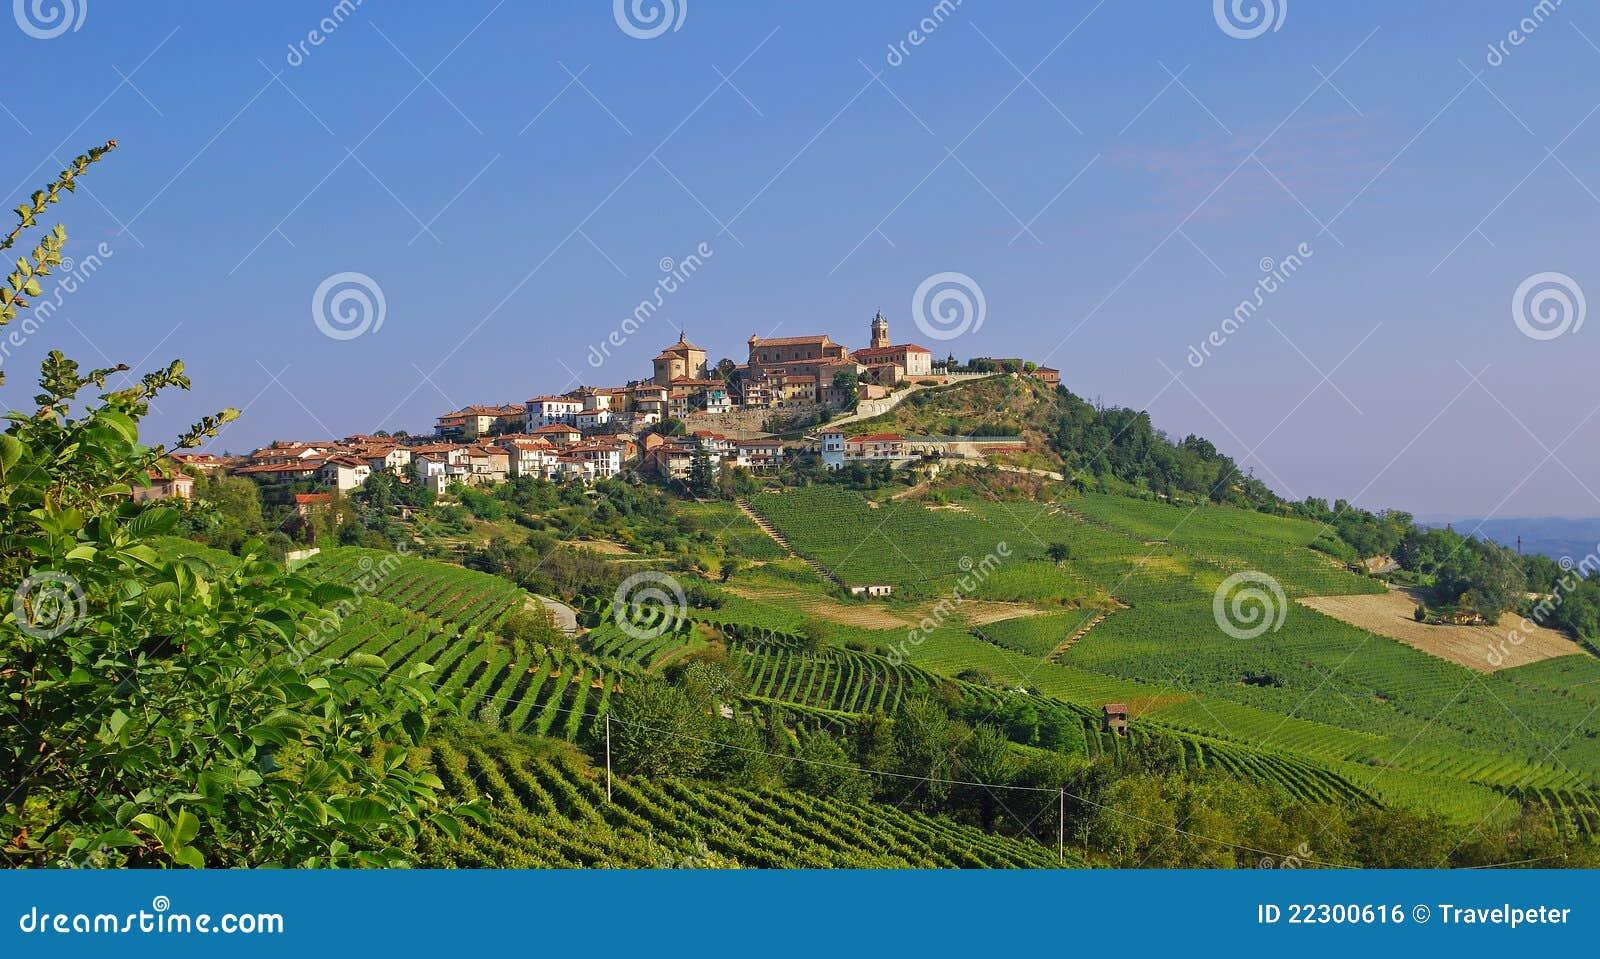 La Morra in Piedmont